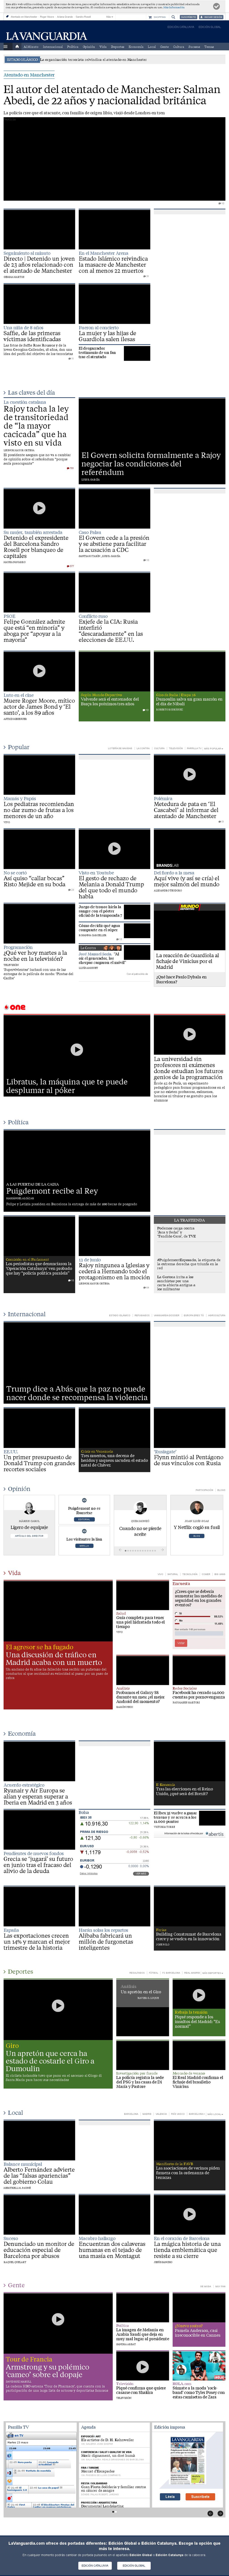 La Vanguardia at Tuesday May 23, 2017, 7:41 p.m. UTC